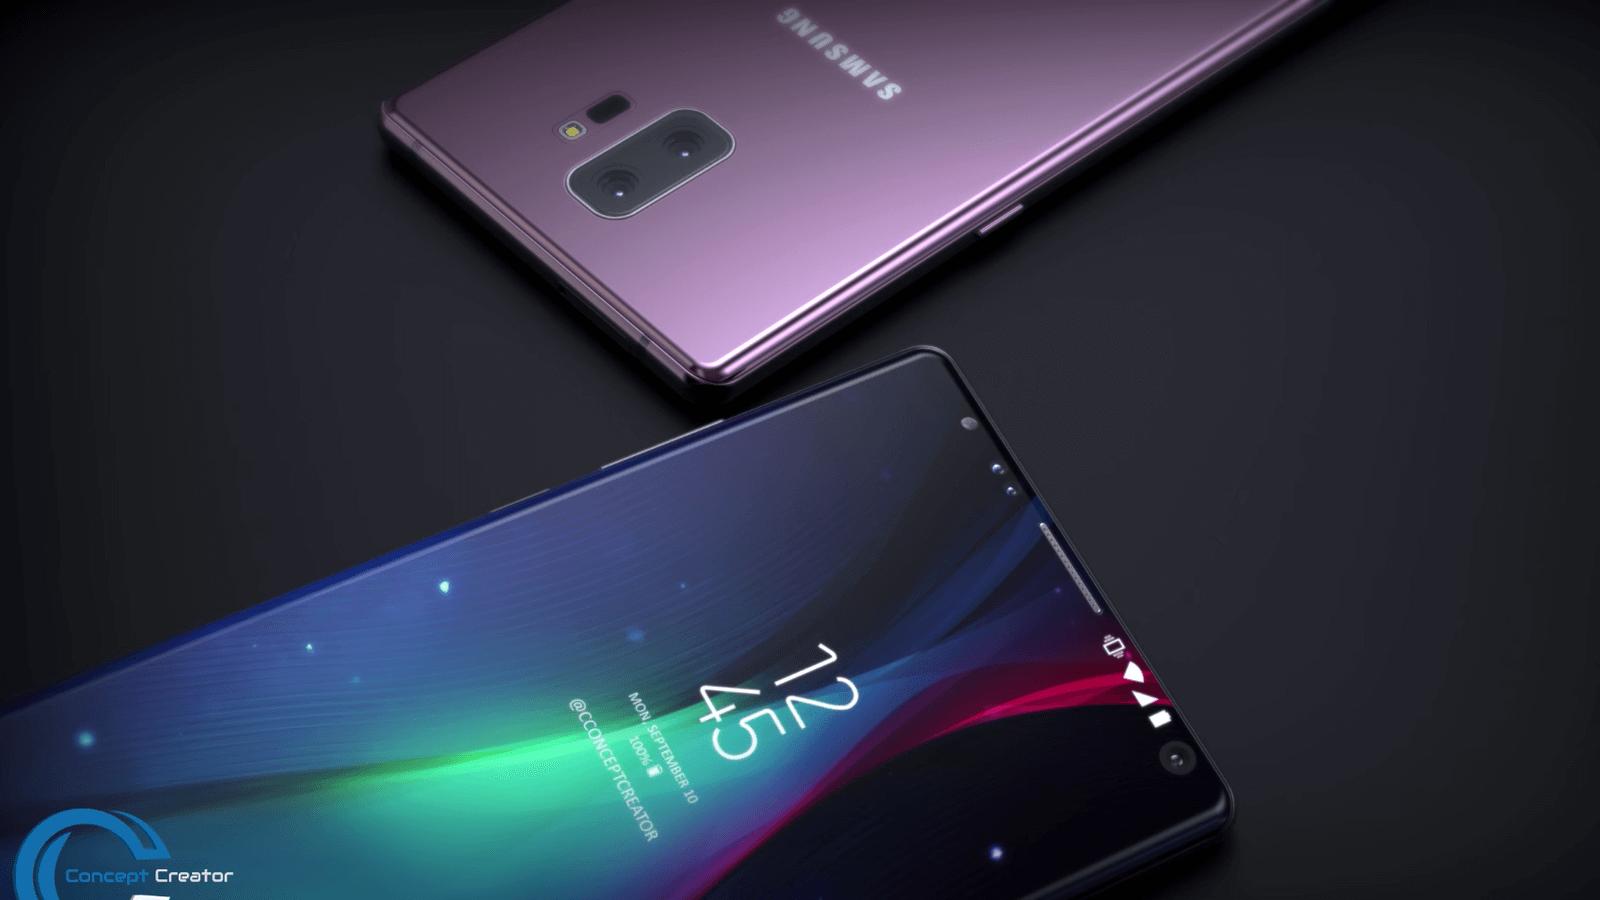 samsung-galaxy-note-9-smartphone